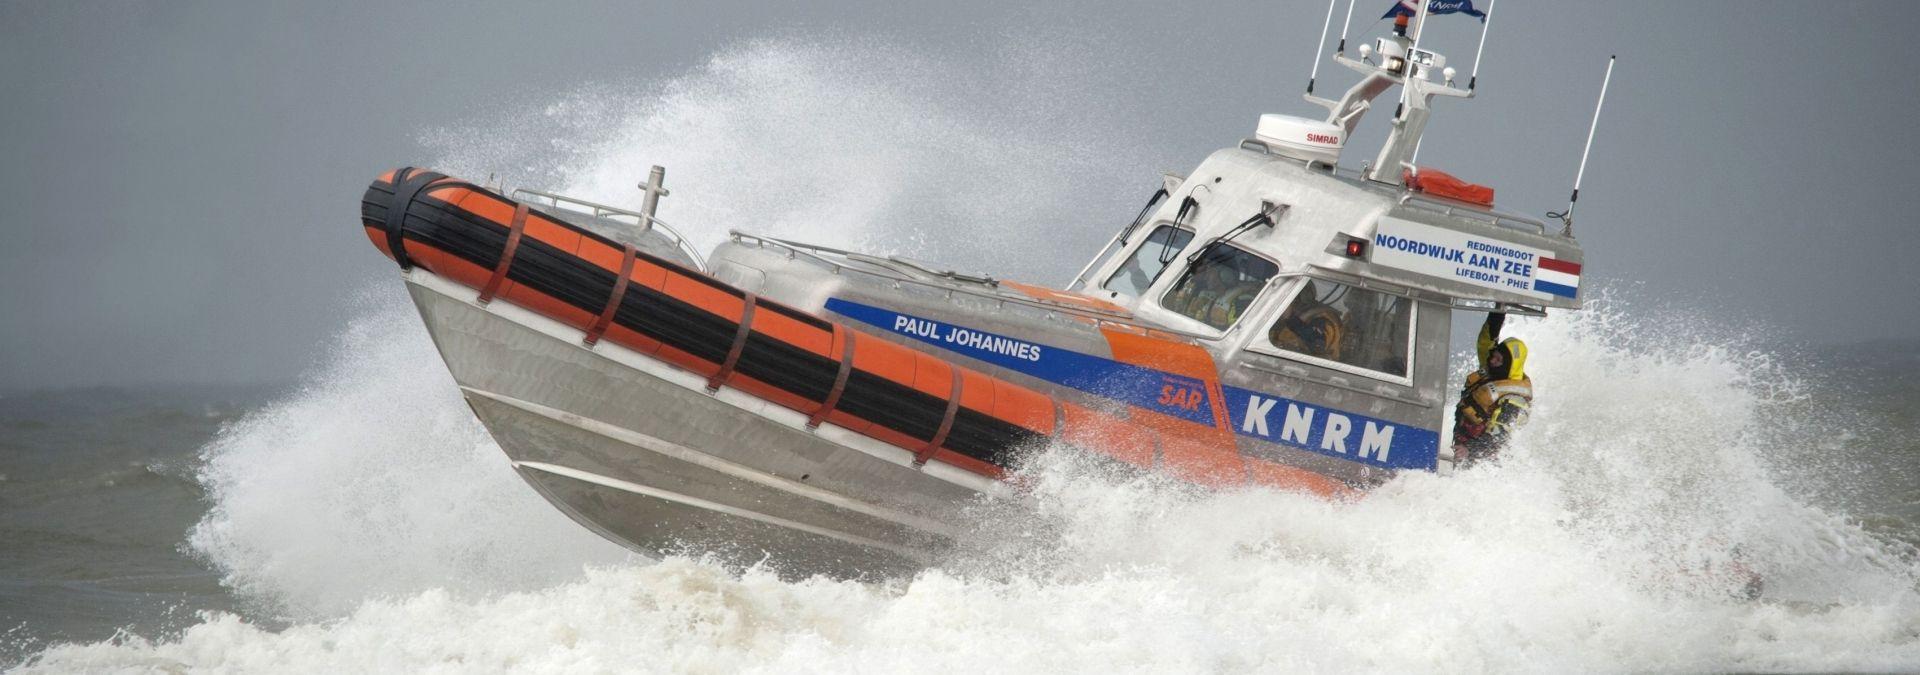 Reddingboot Paul Johannes